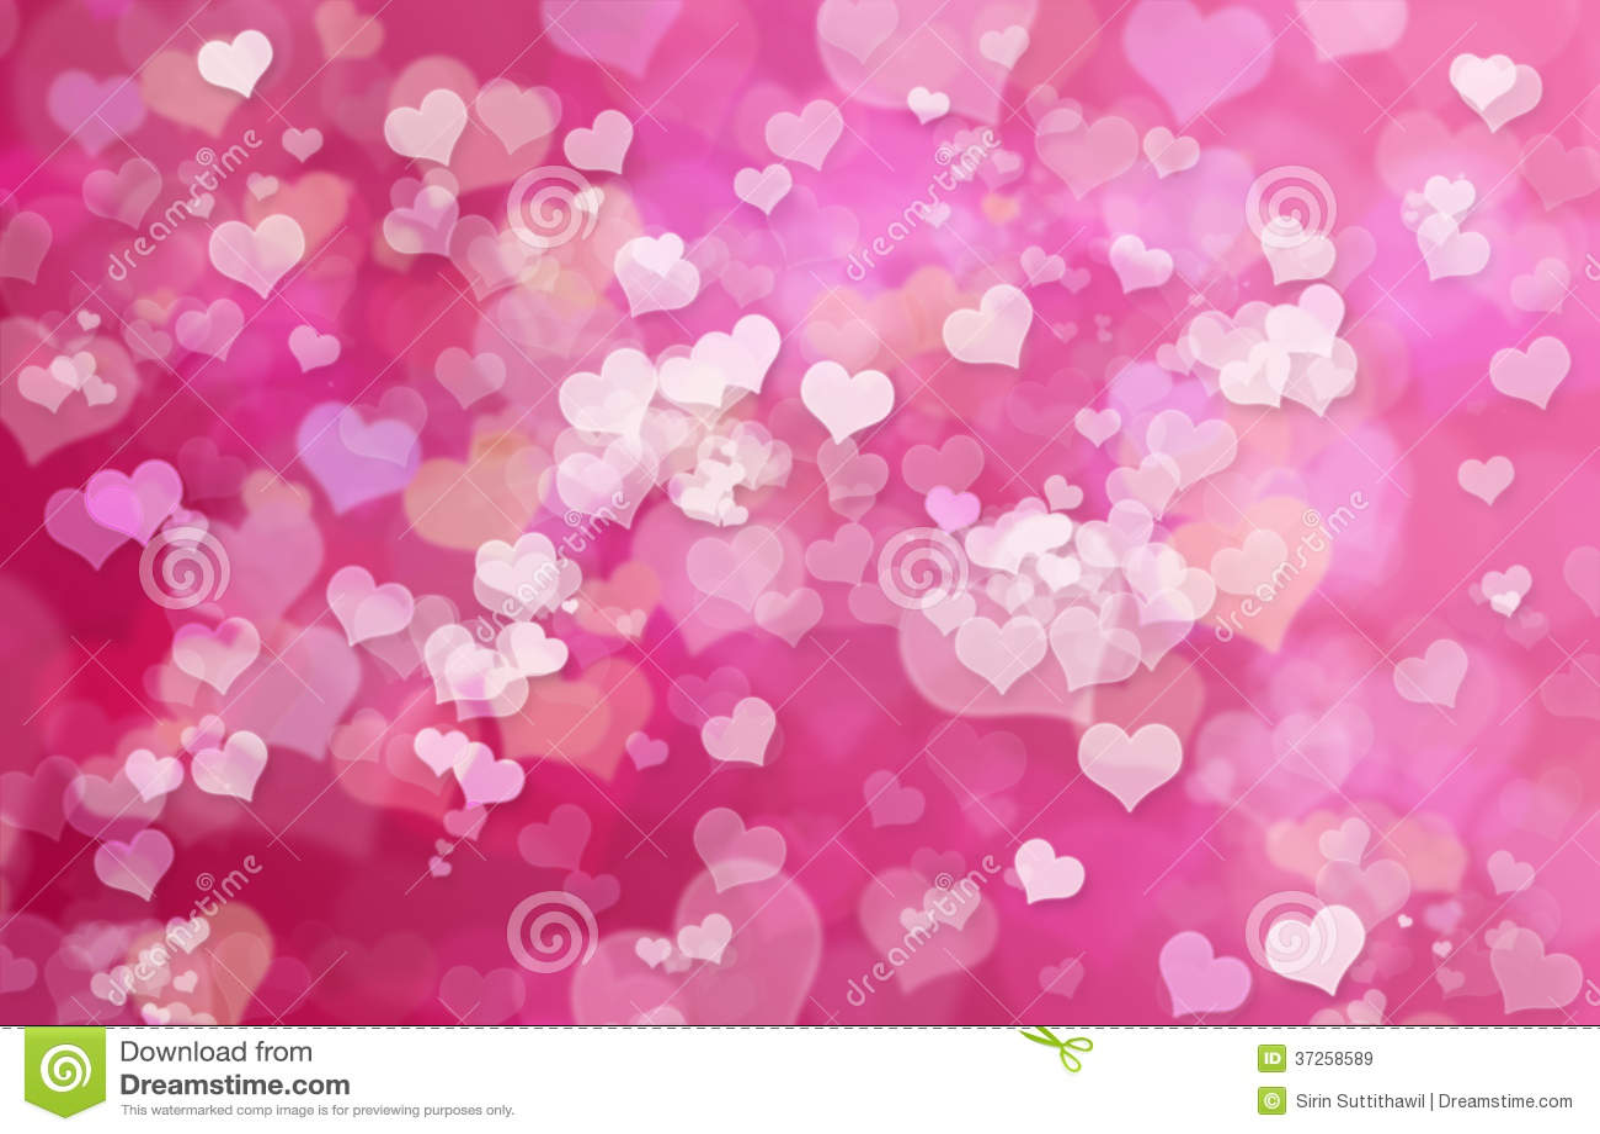 Valentine Hearts Abstract Pink Background Valentinstag